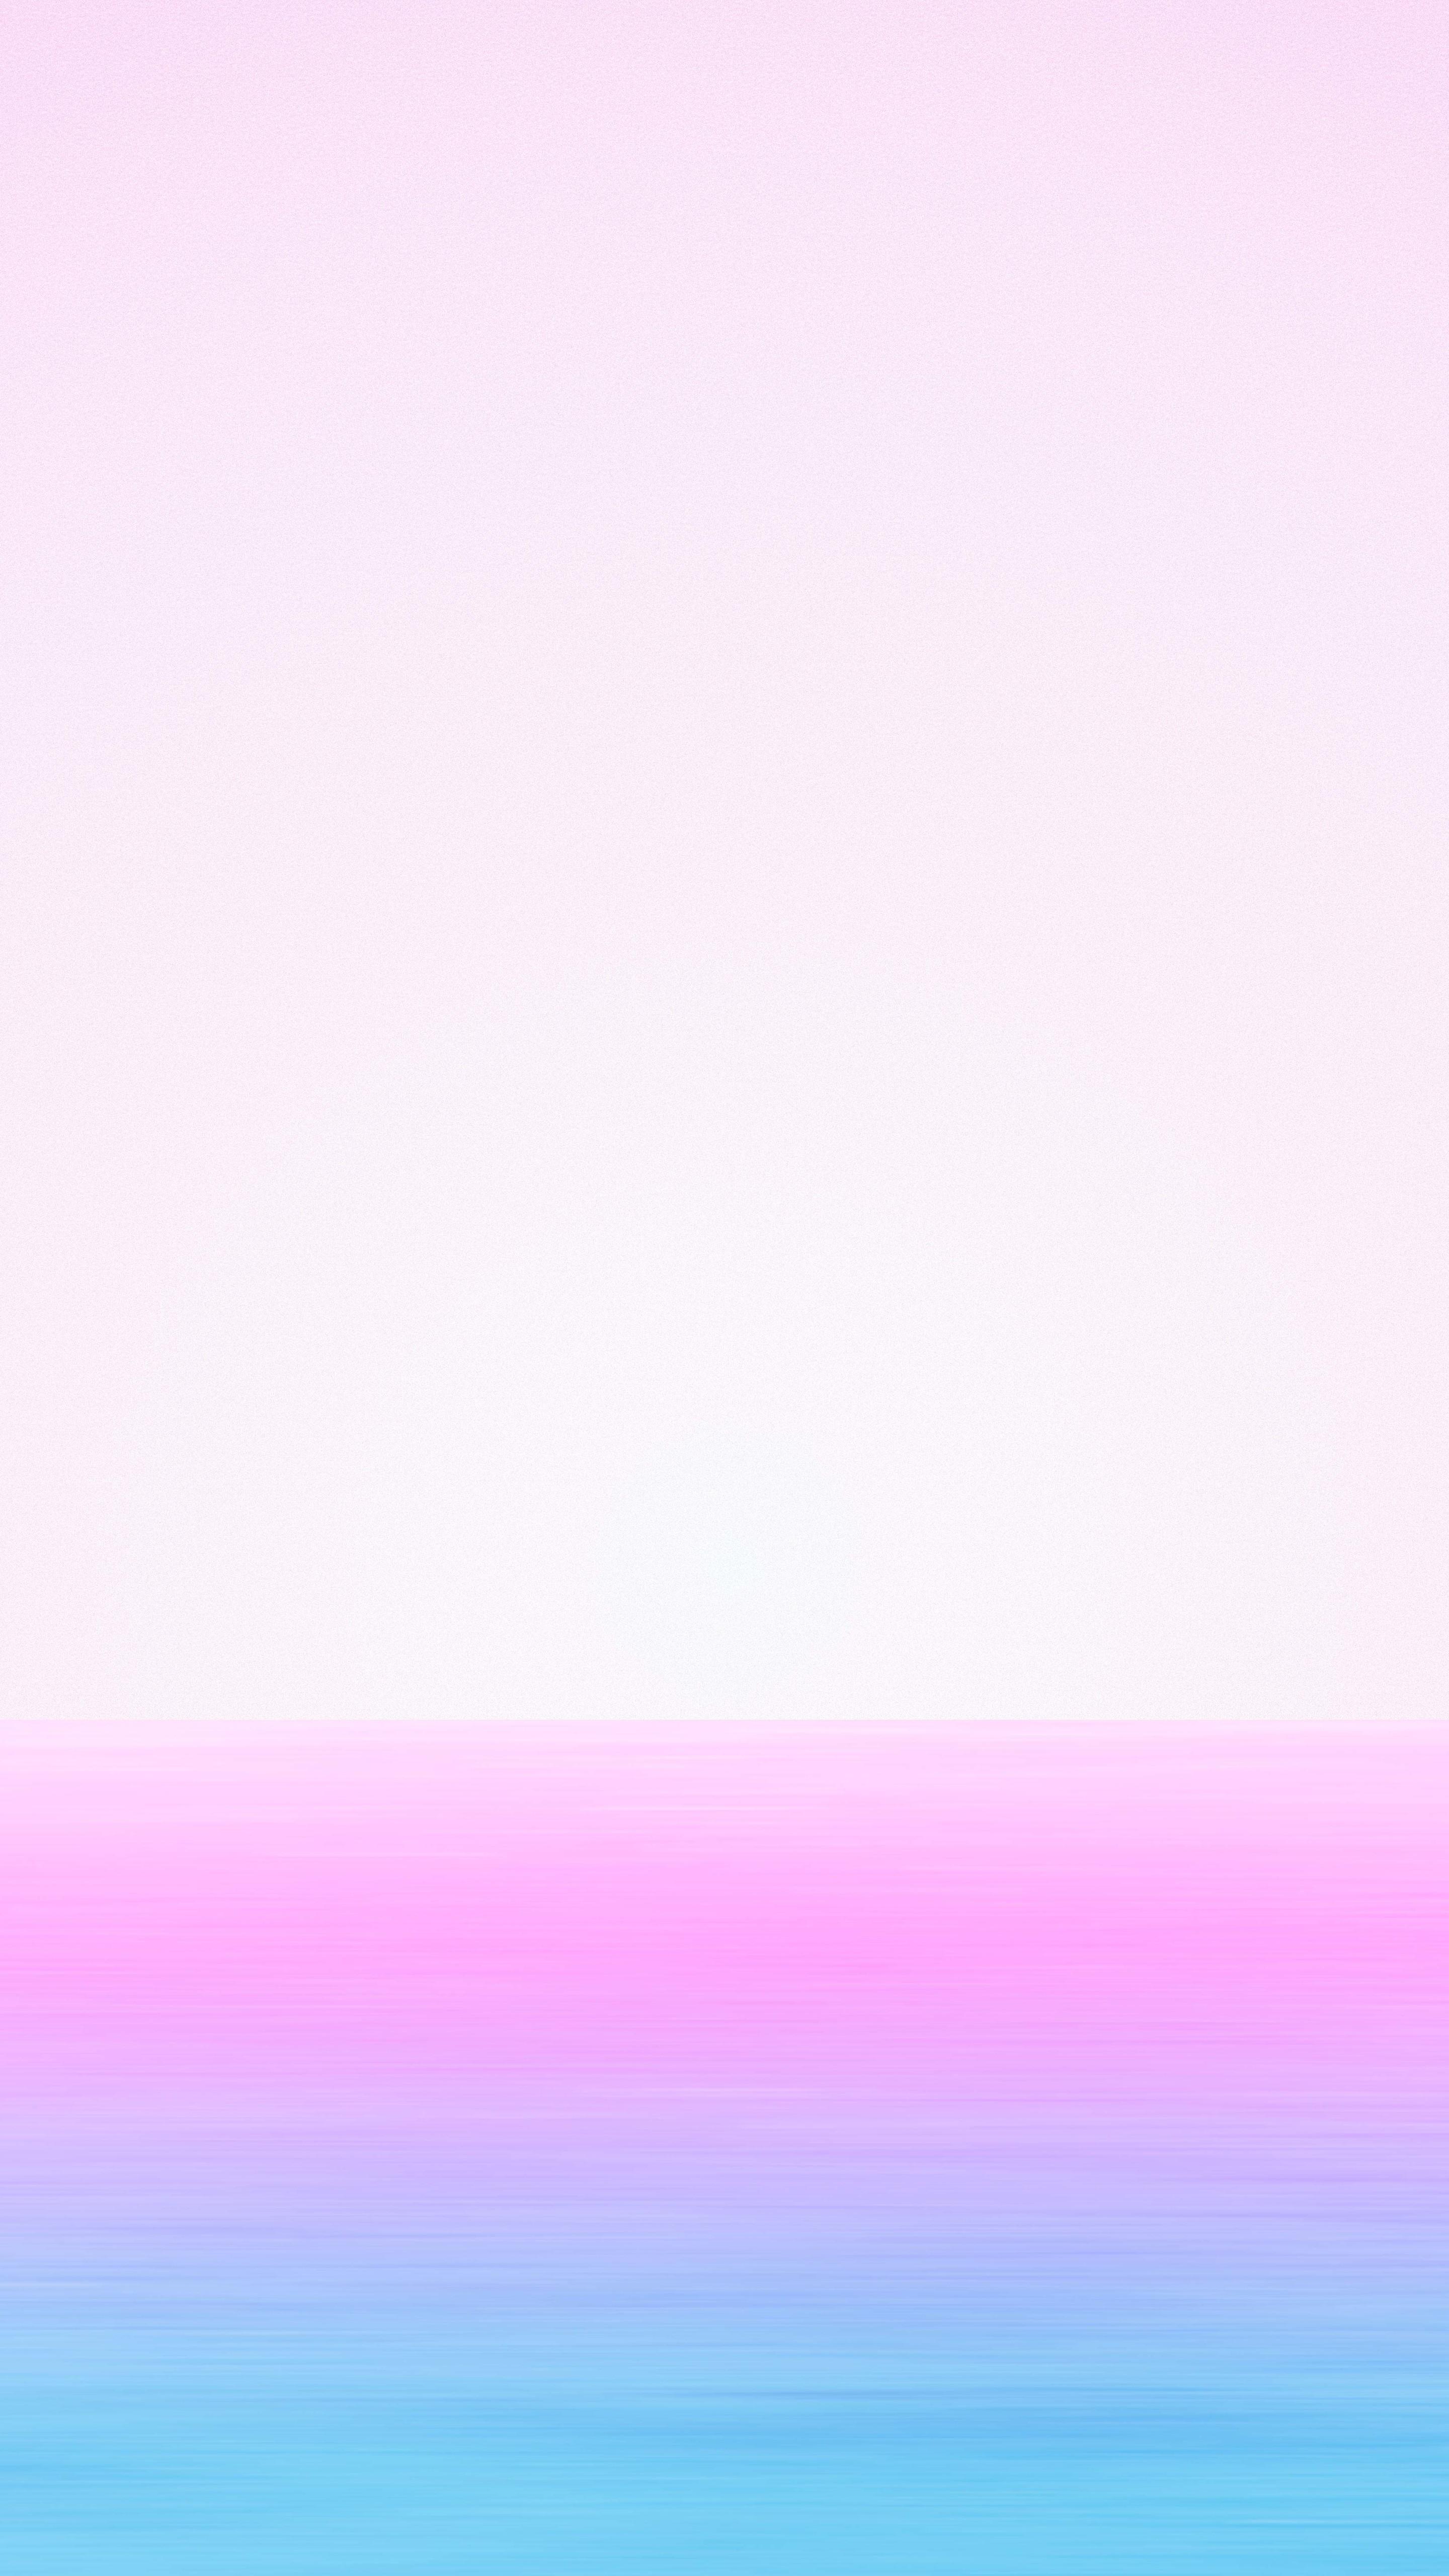 Love-lake-wallpaper-wp4607904